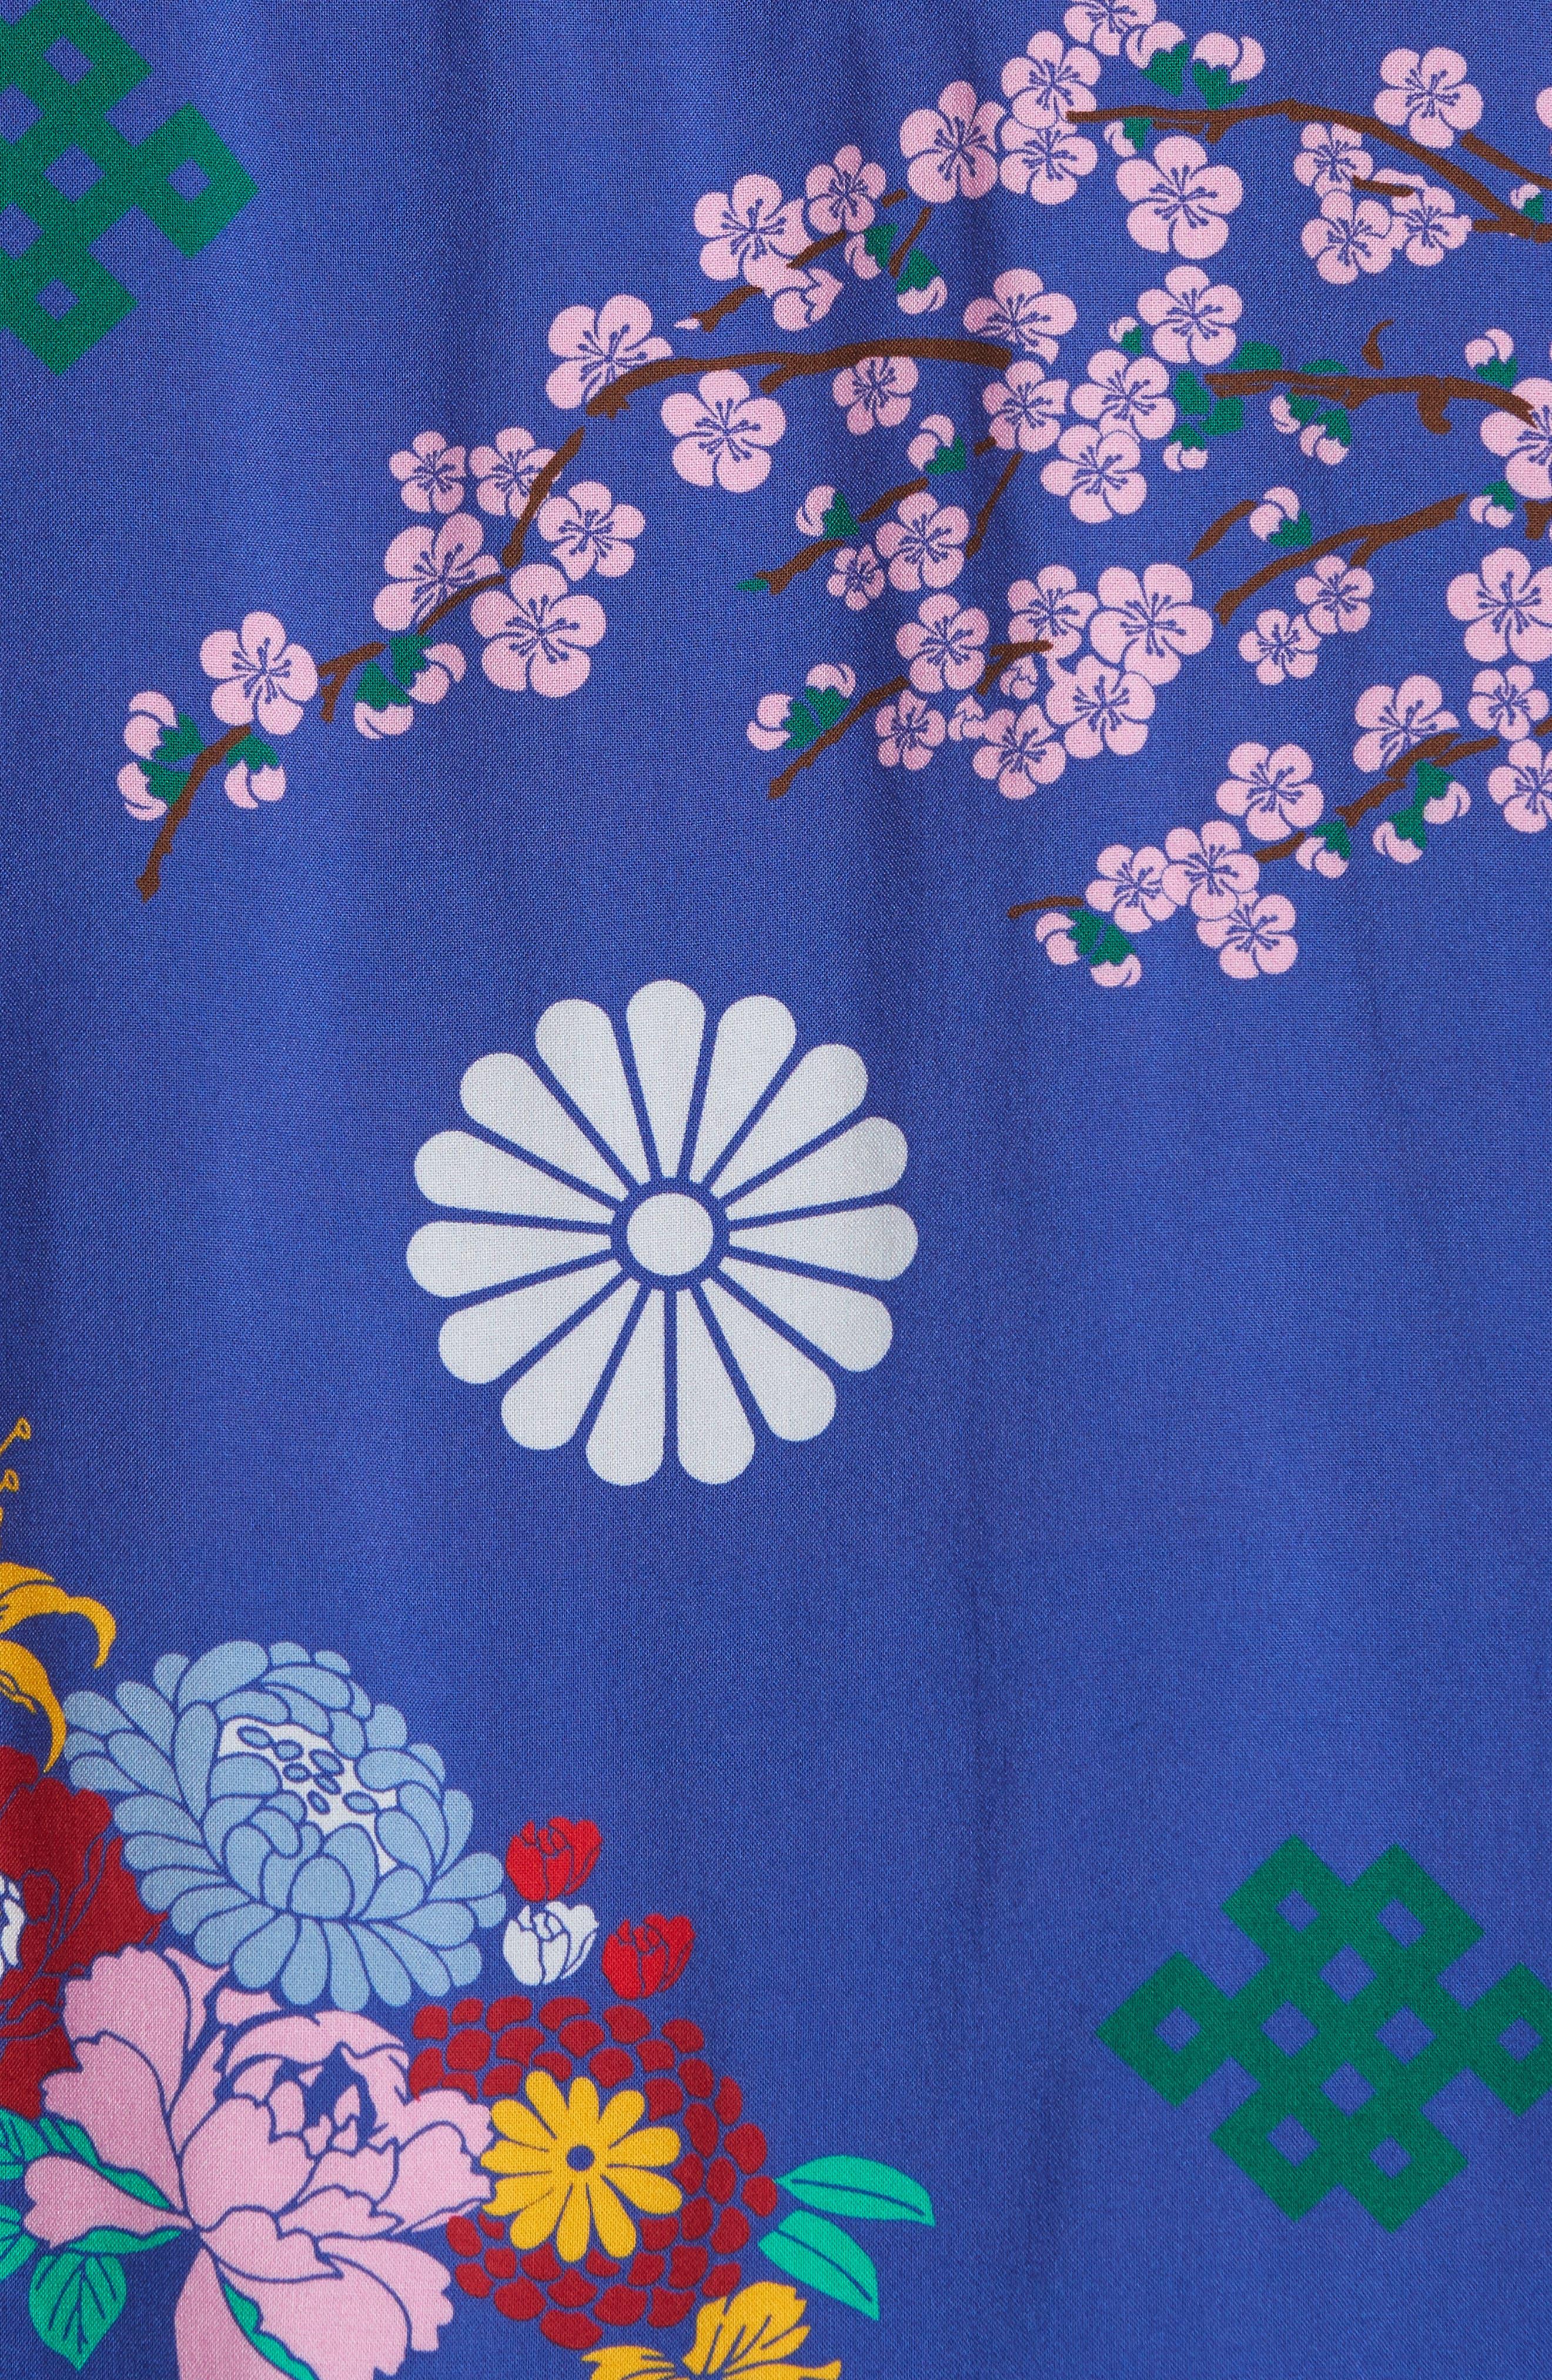 x The North Face Men's Floral Print Camp Shirt,                             Alternate thumbnail 6, color,                             400